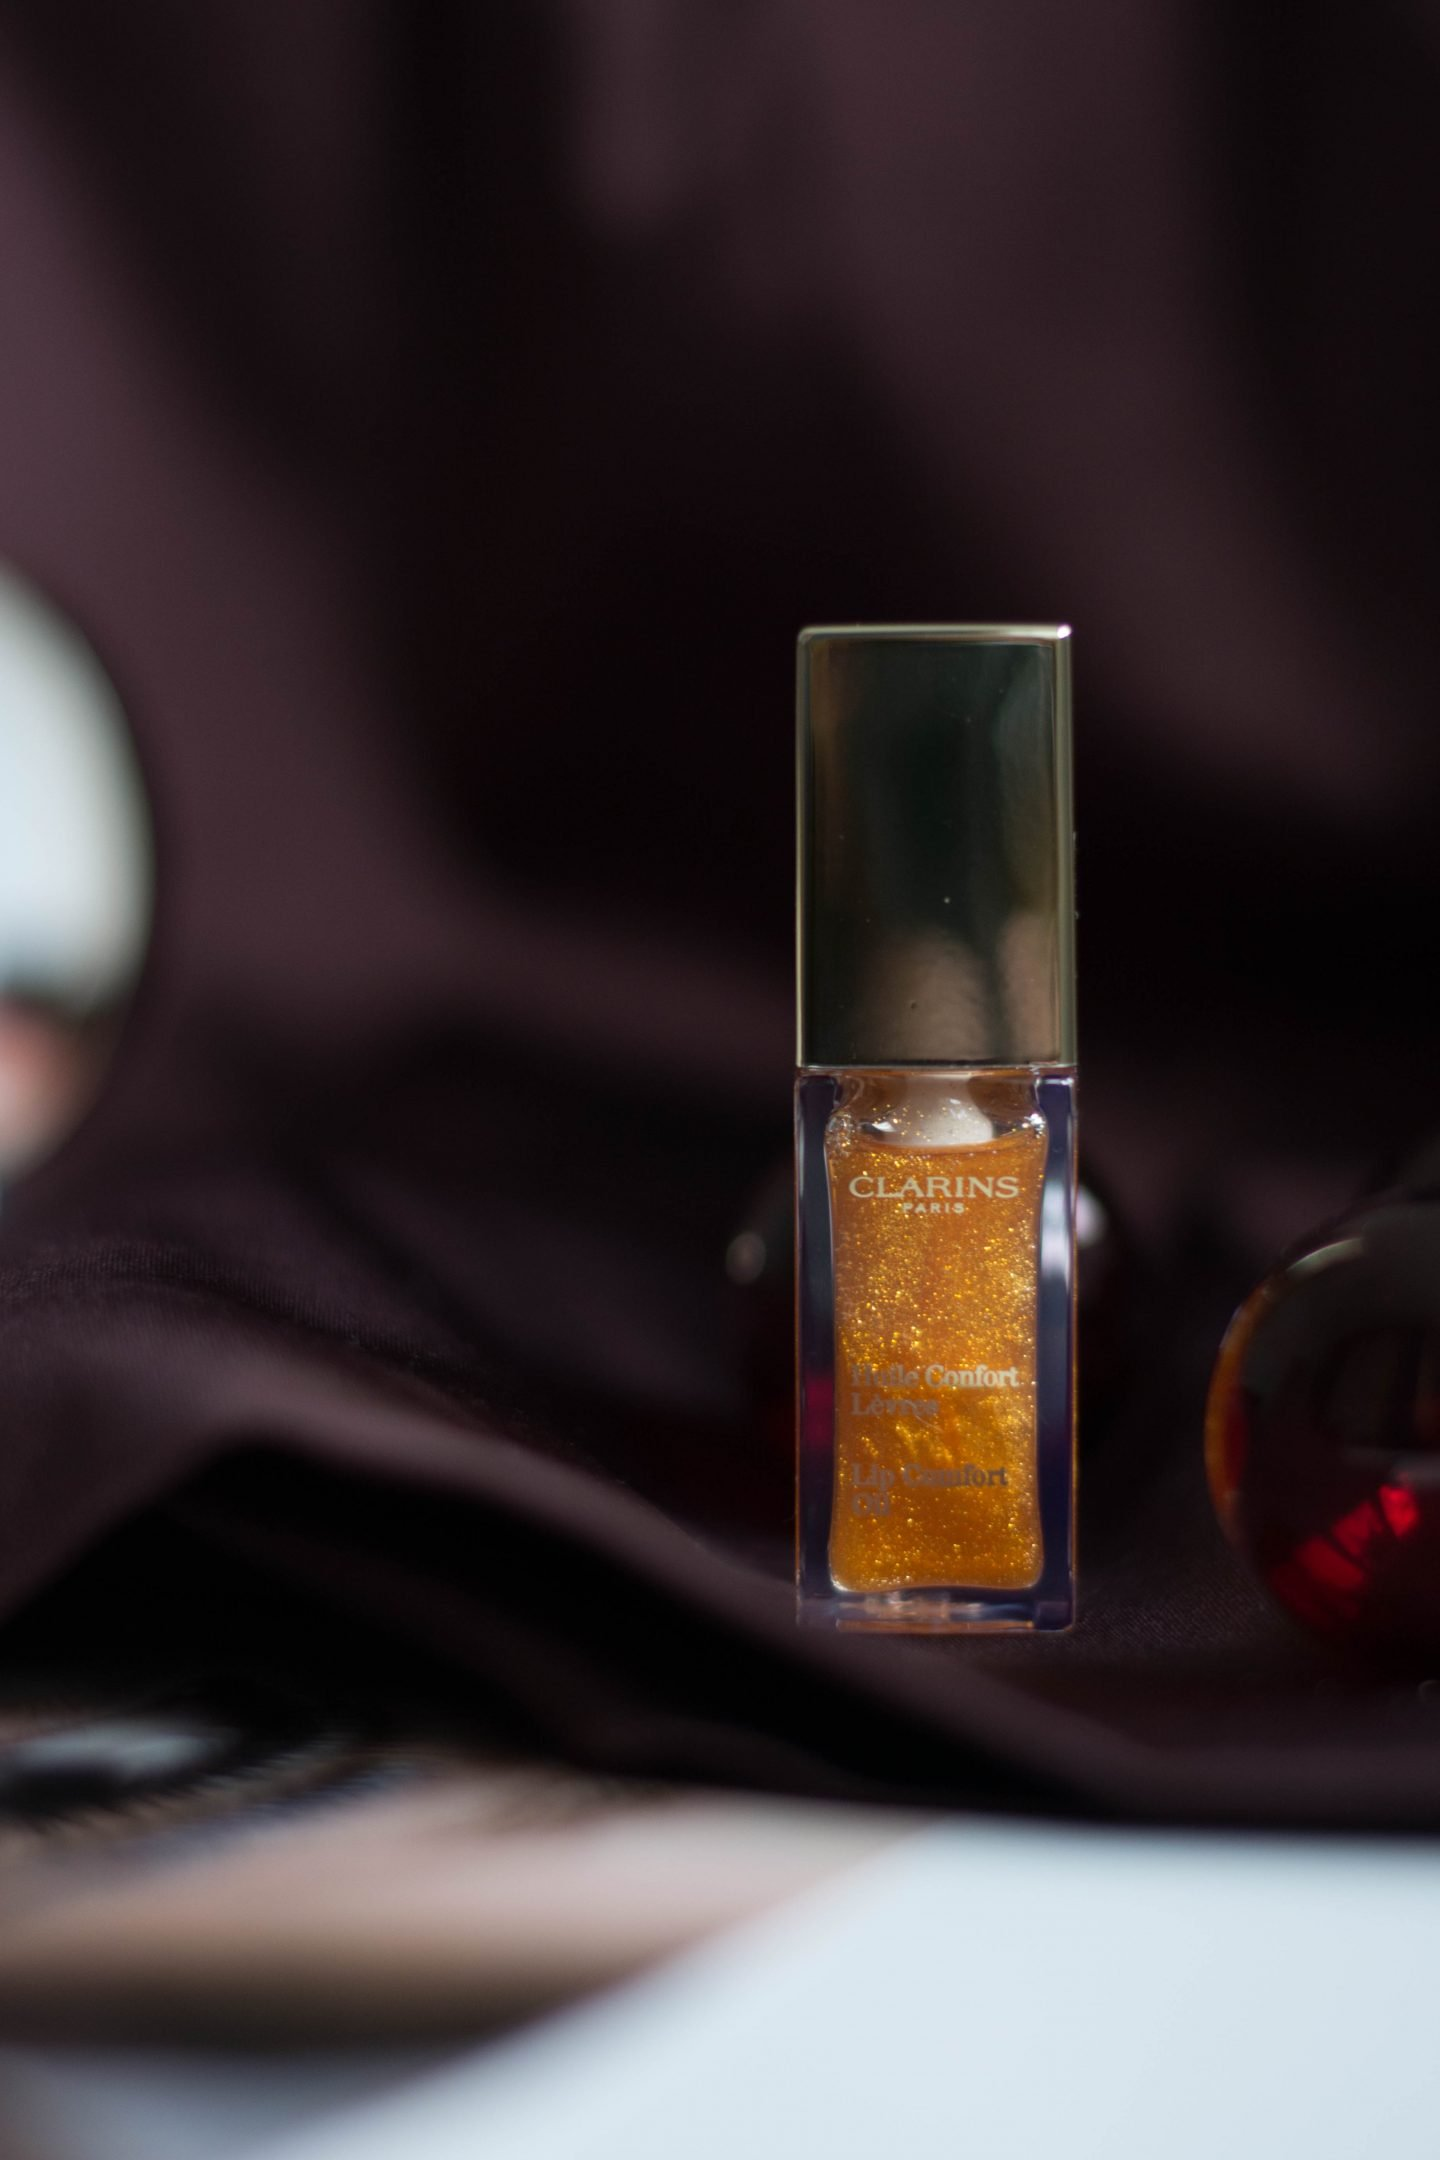 Golden Glitter, Honey Glam, Huile Confort Lèvres, Lippenöl, Lippenpflege, Glanz, Lipgloss, festlich, Gold